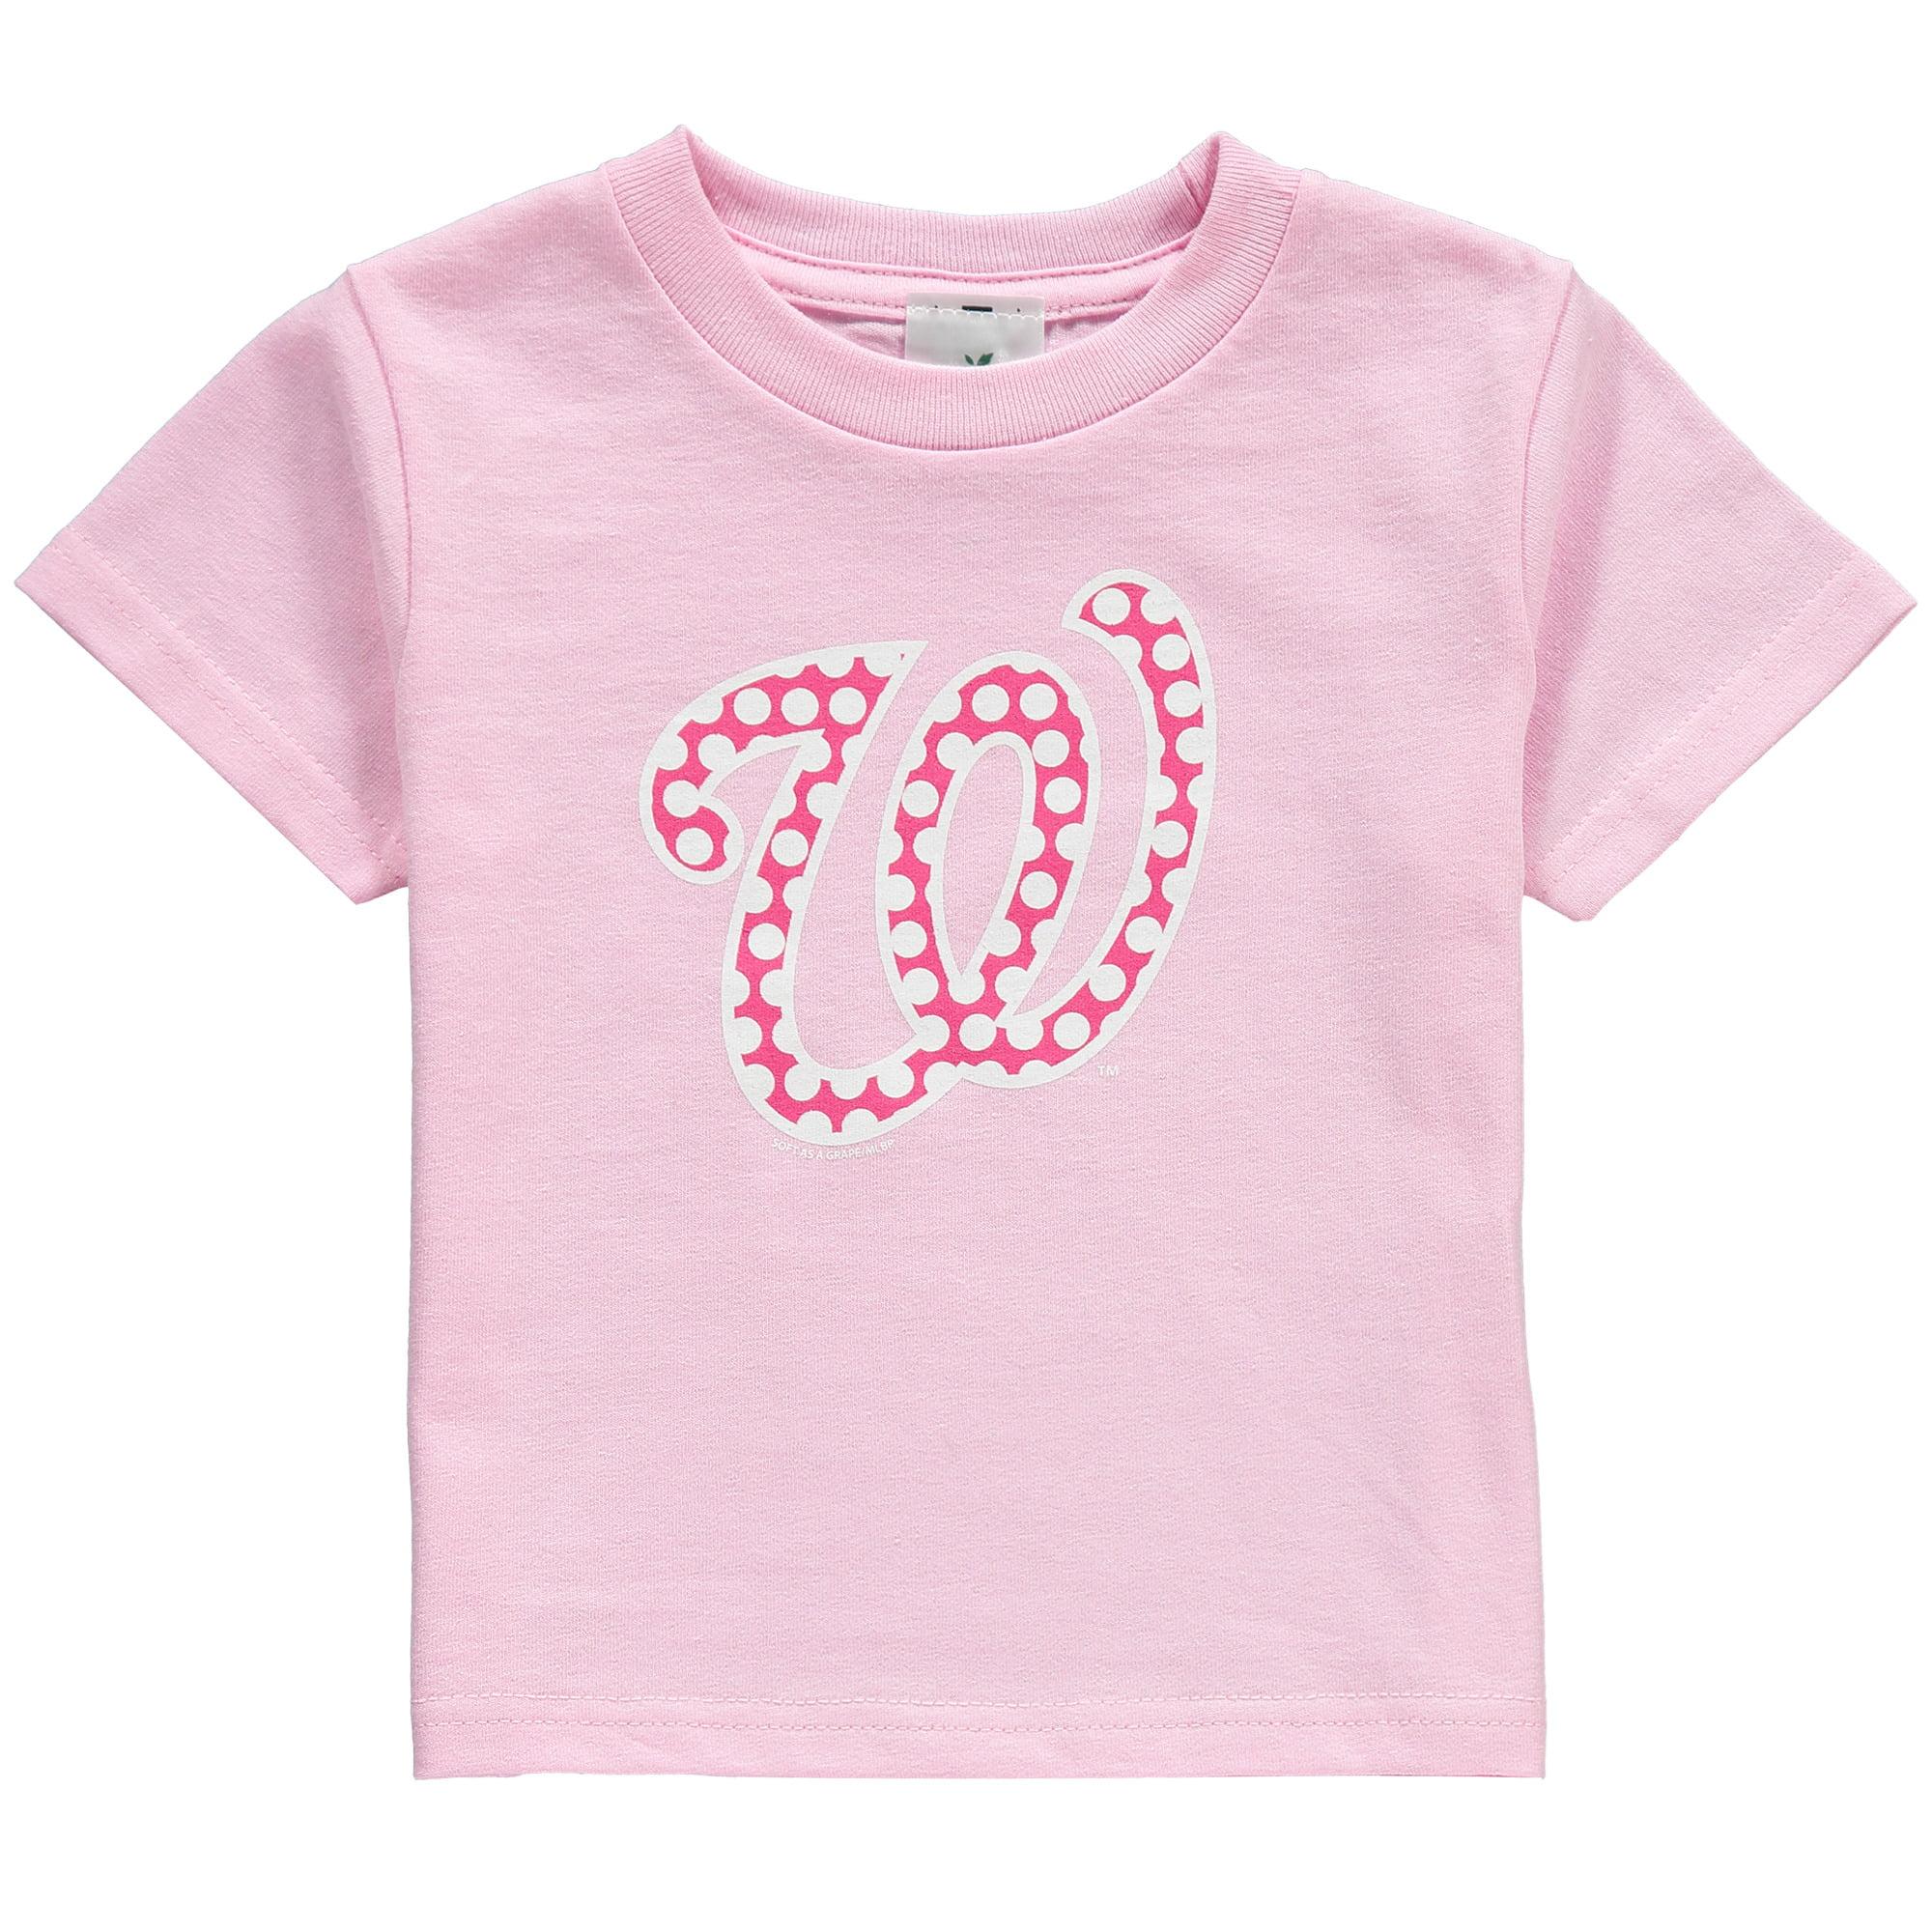 Washington Nationals Soft as a Grape Toddler Girls Polka Dot Logo T-Shirt - Pink